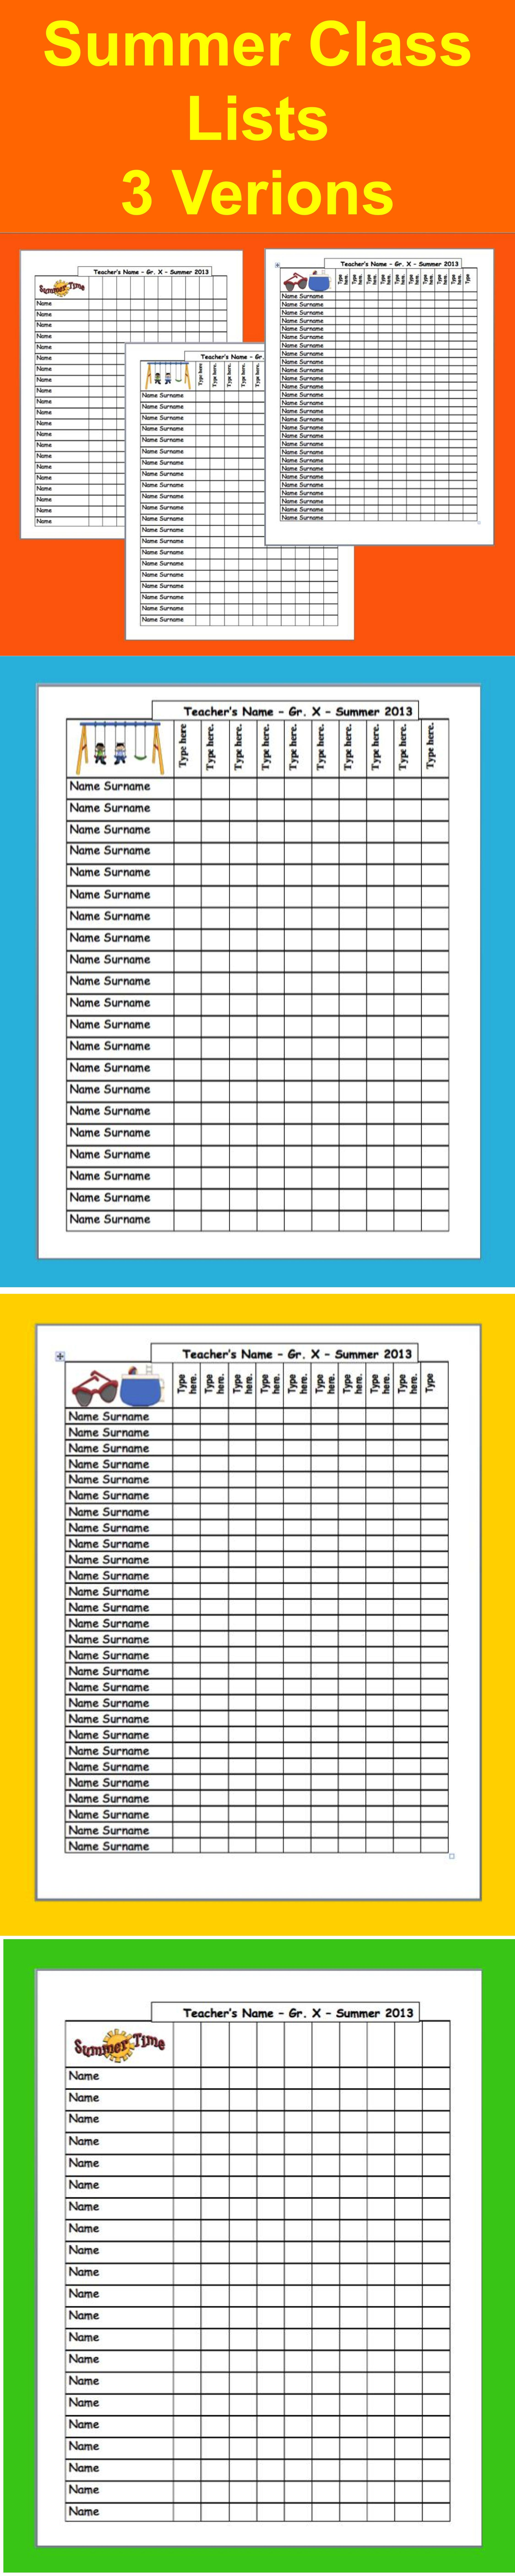 summer school class list templates 3 to choose summer school. Black Bedroom Furniture Sets. Home Design Ideas